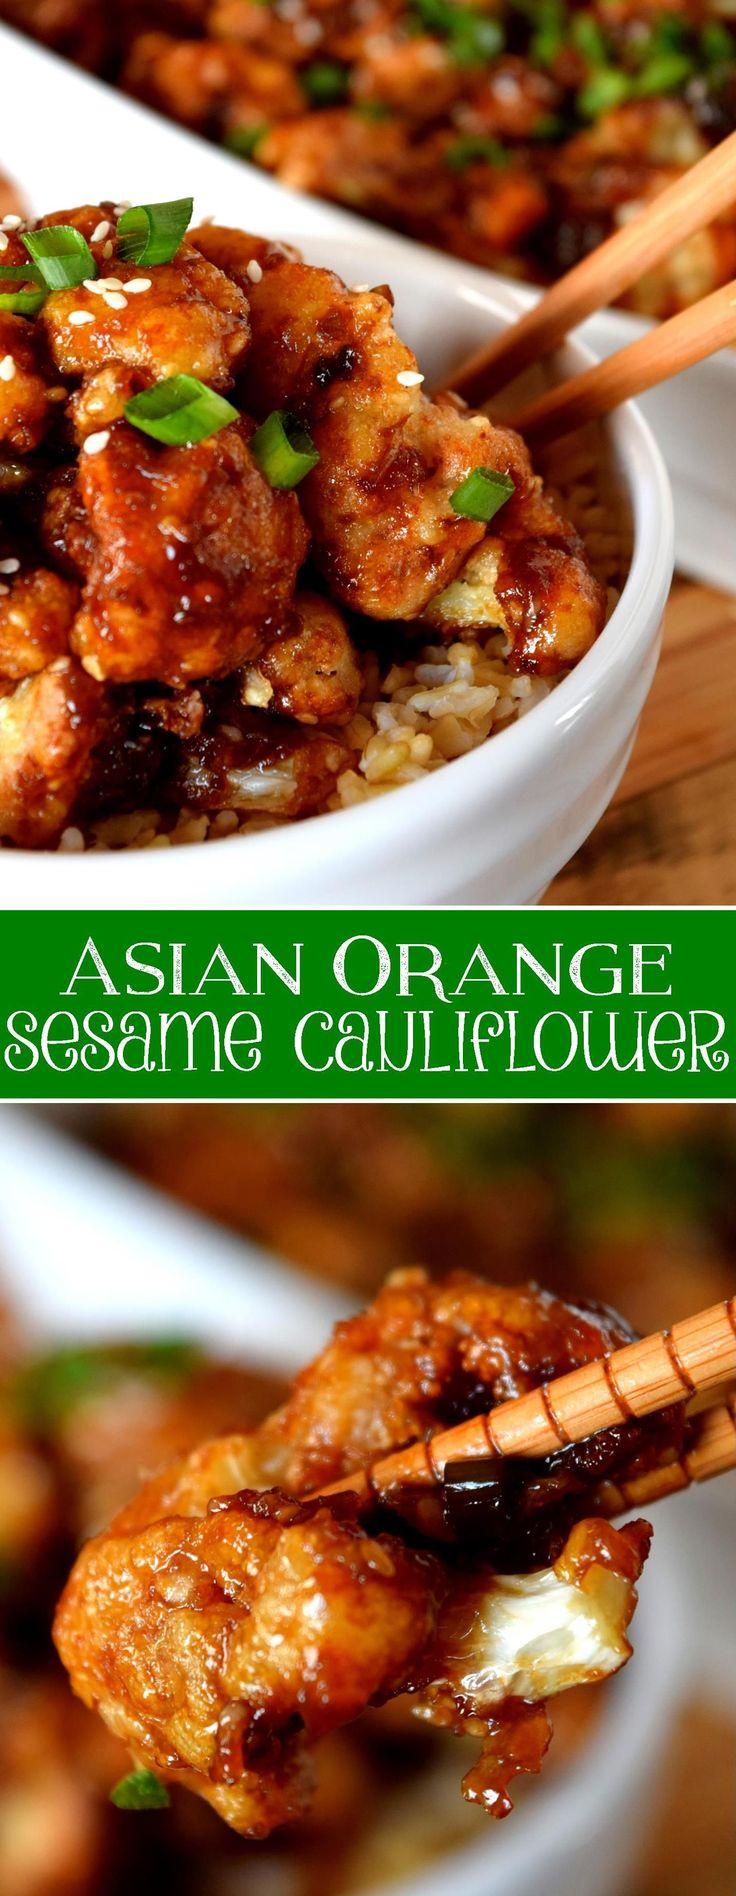 Asian Orange Sesame Cauliflower